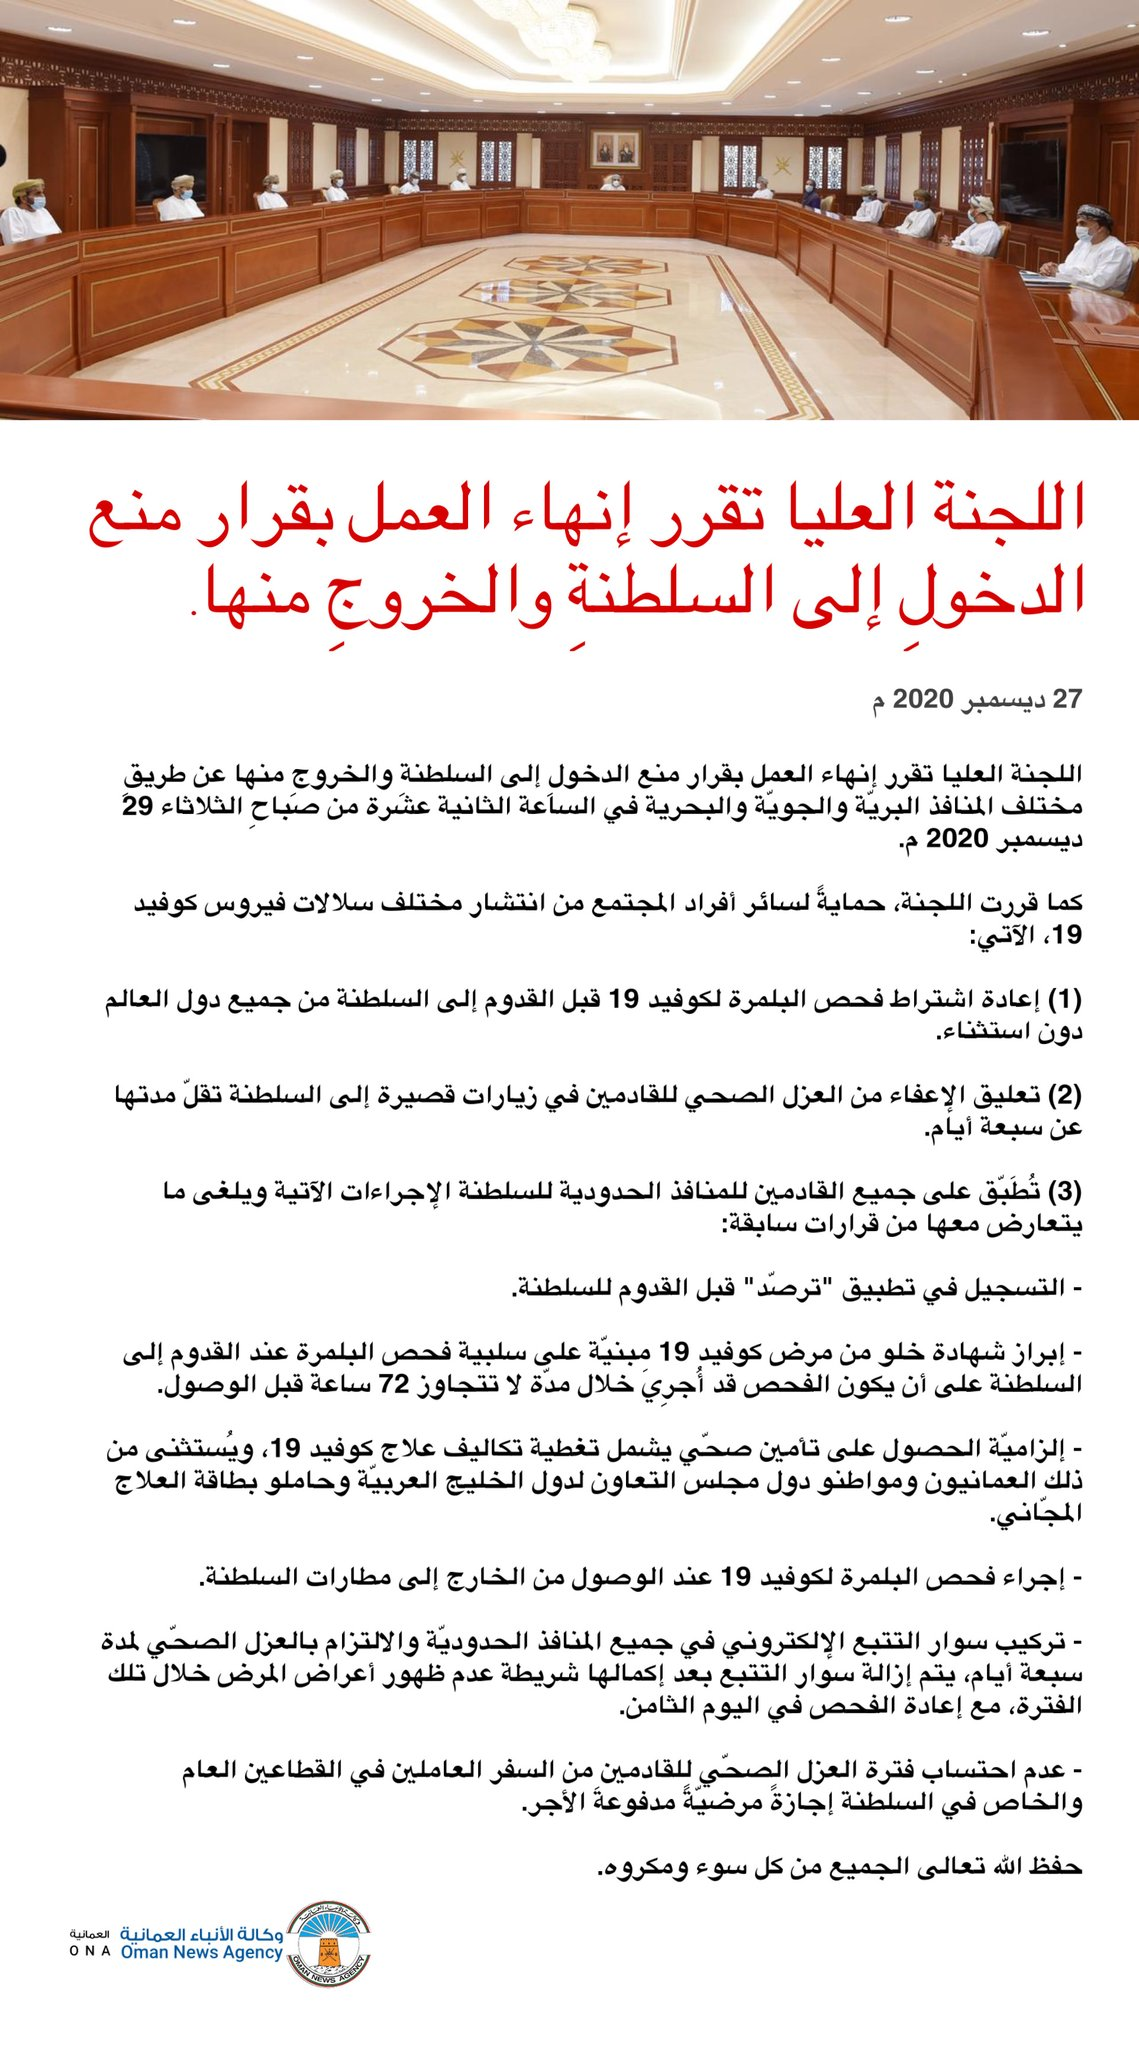 EqPShmNW4AMjDnF - سلطنة عمان تعيد فتح المنافذ البريّة والجويّة والبحرية